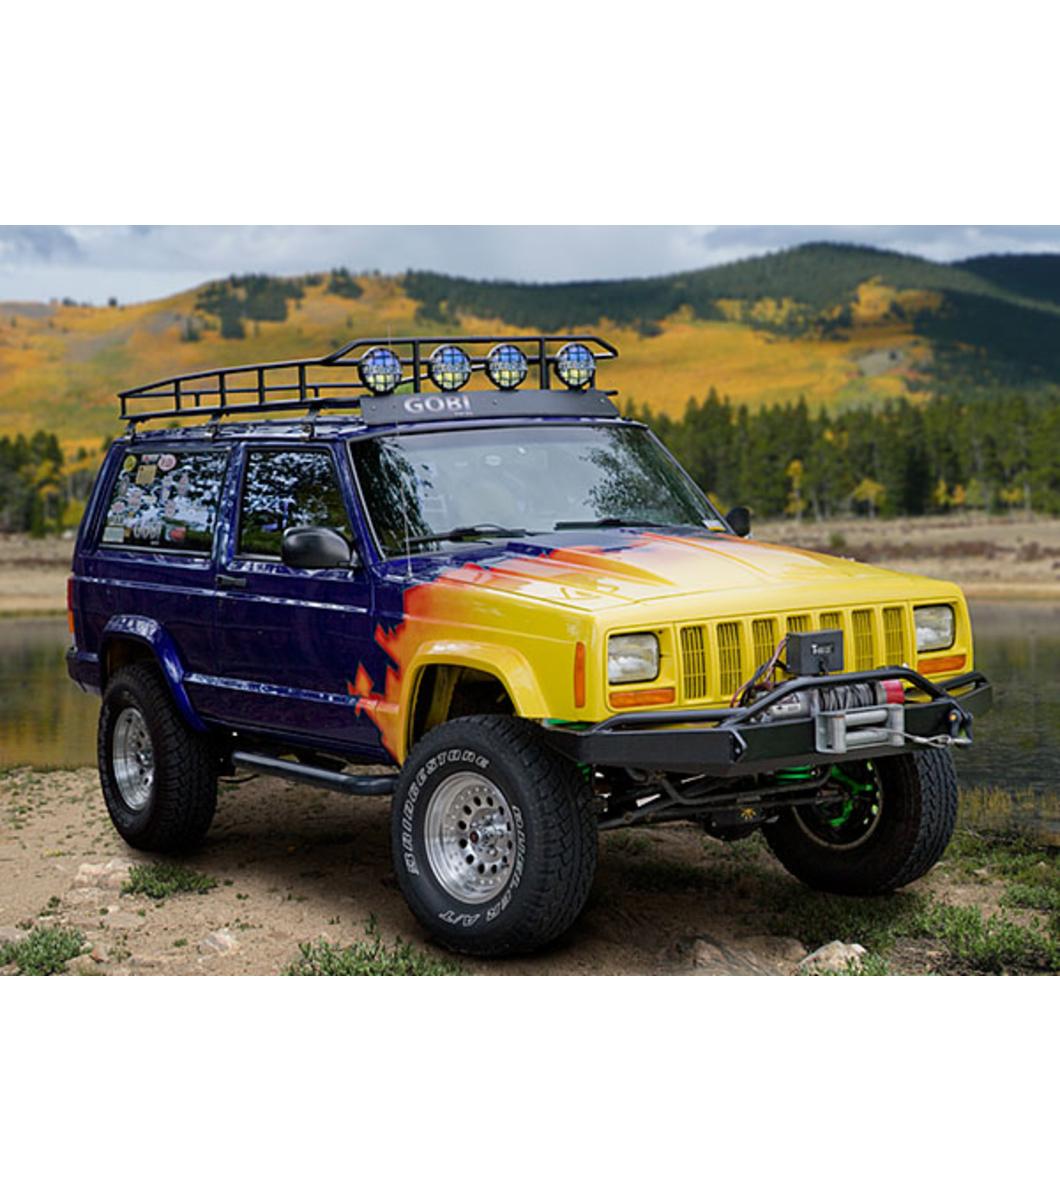 Jeep Cherokee Xjranger Rack 183 Multi Light Setup 183 No Sunroof